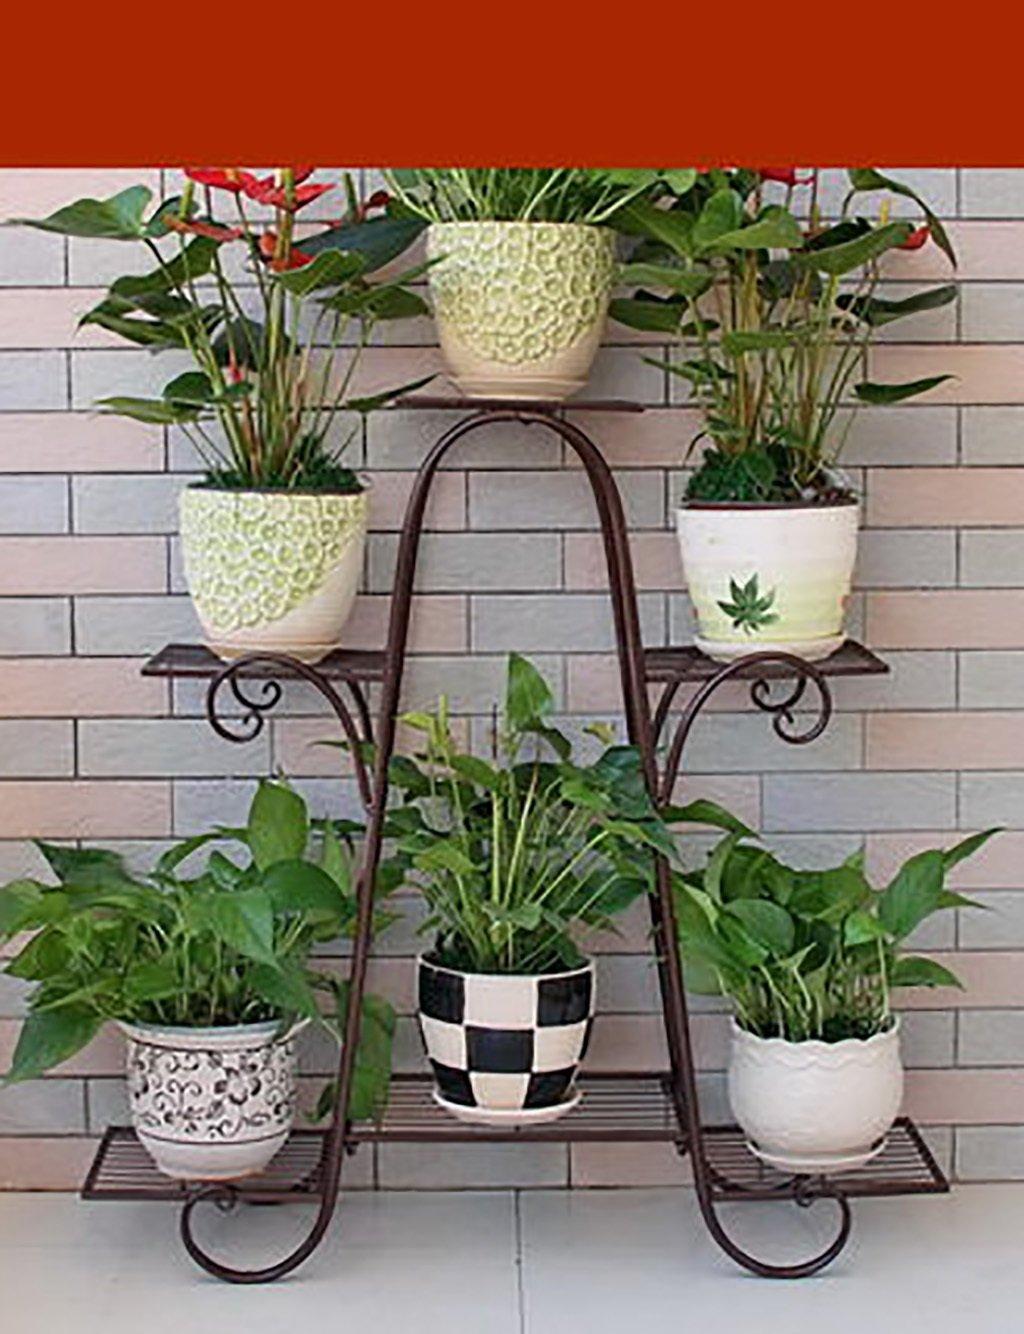 GAOCHAOXIANGHJ Blumentopf Regal Eisen Bodenart 6 Schichten Blumenregal europäischer Stil Ländlichen Innen- draussen Bonsai steht ( farbe : Messing , größe : 83cm*25cm*83cm )